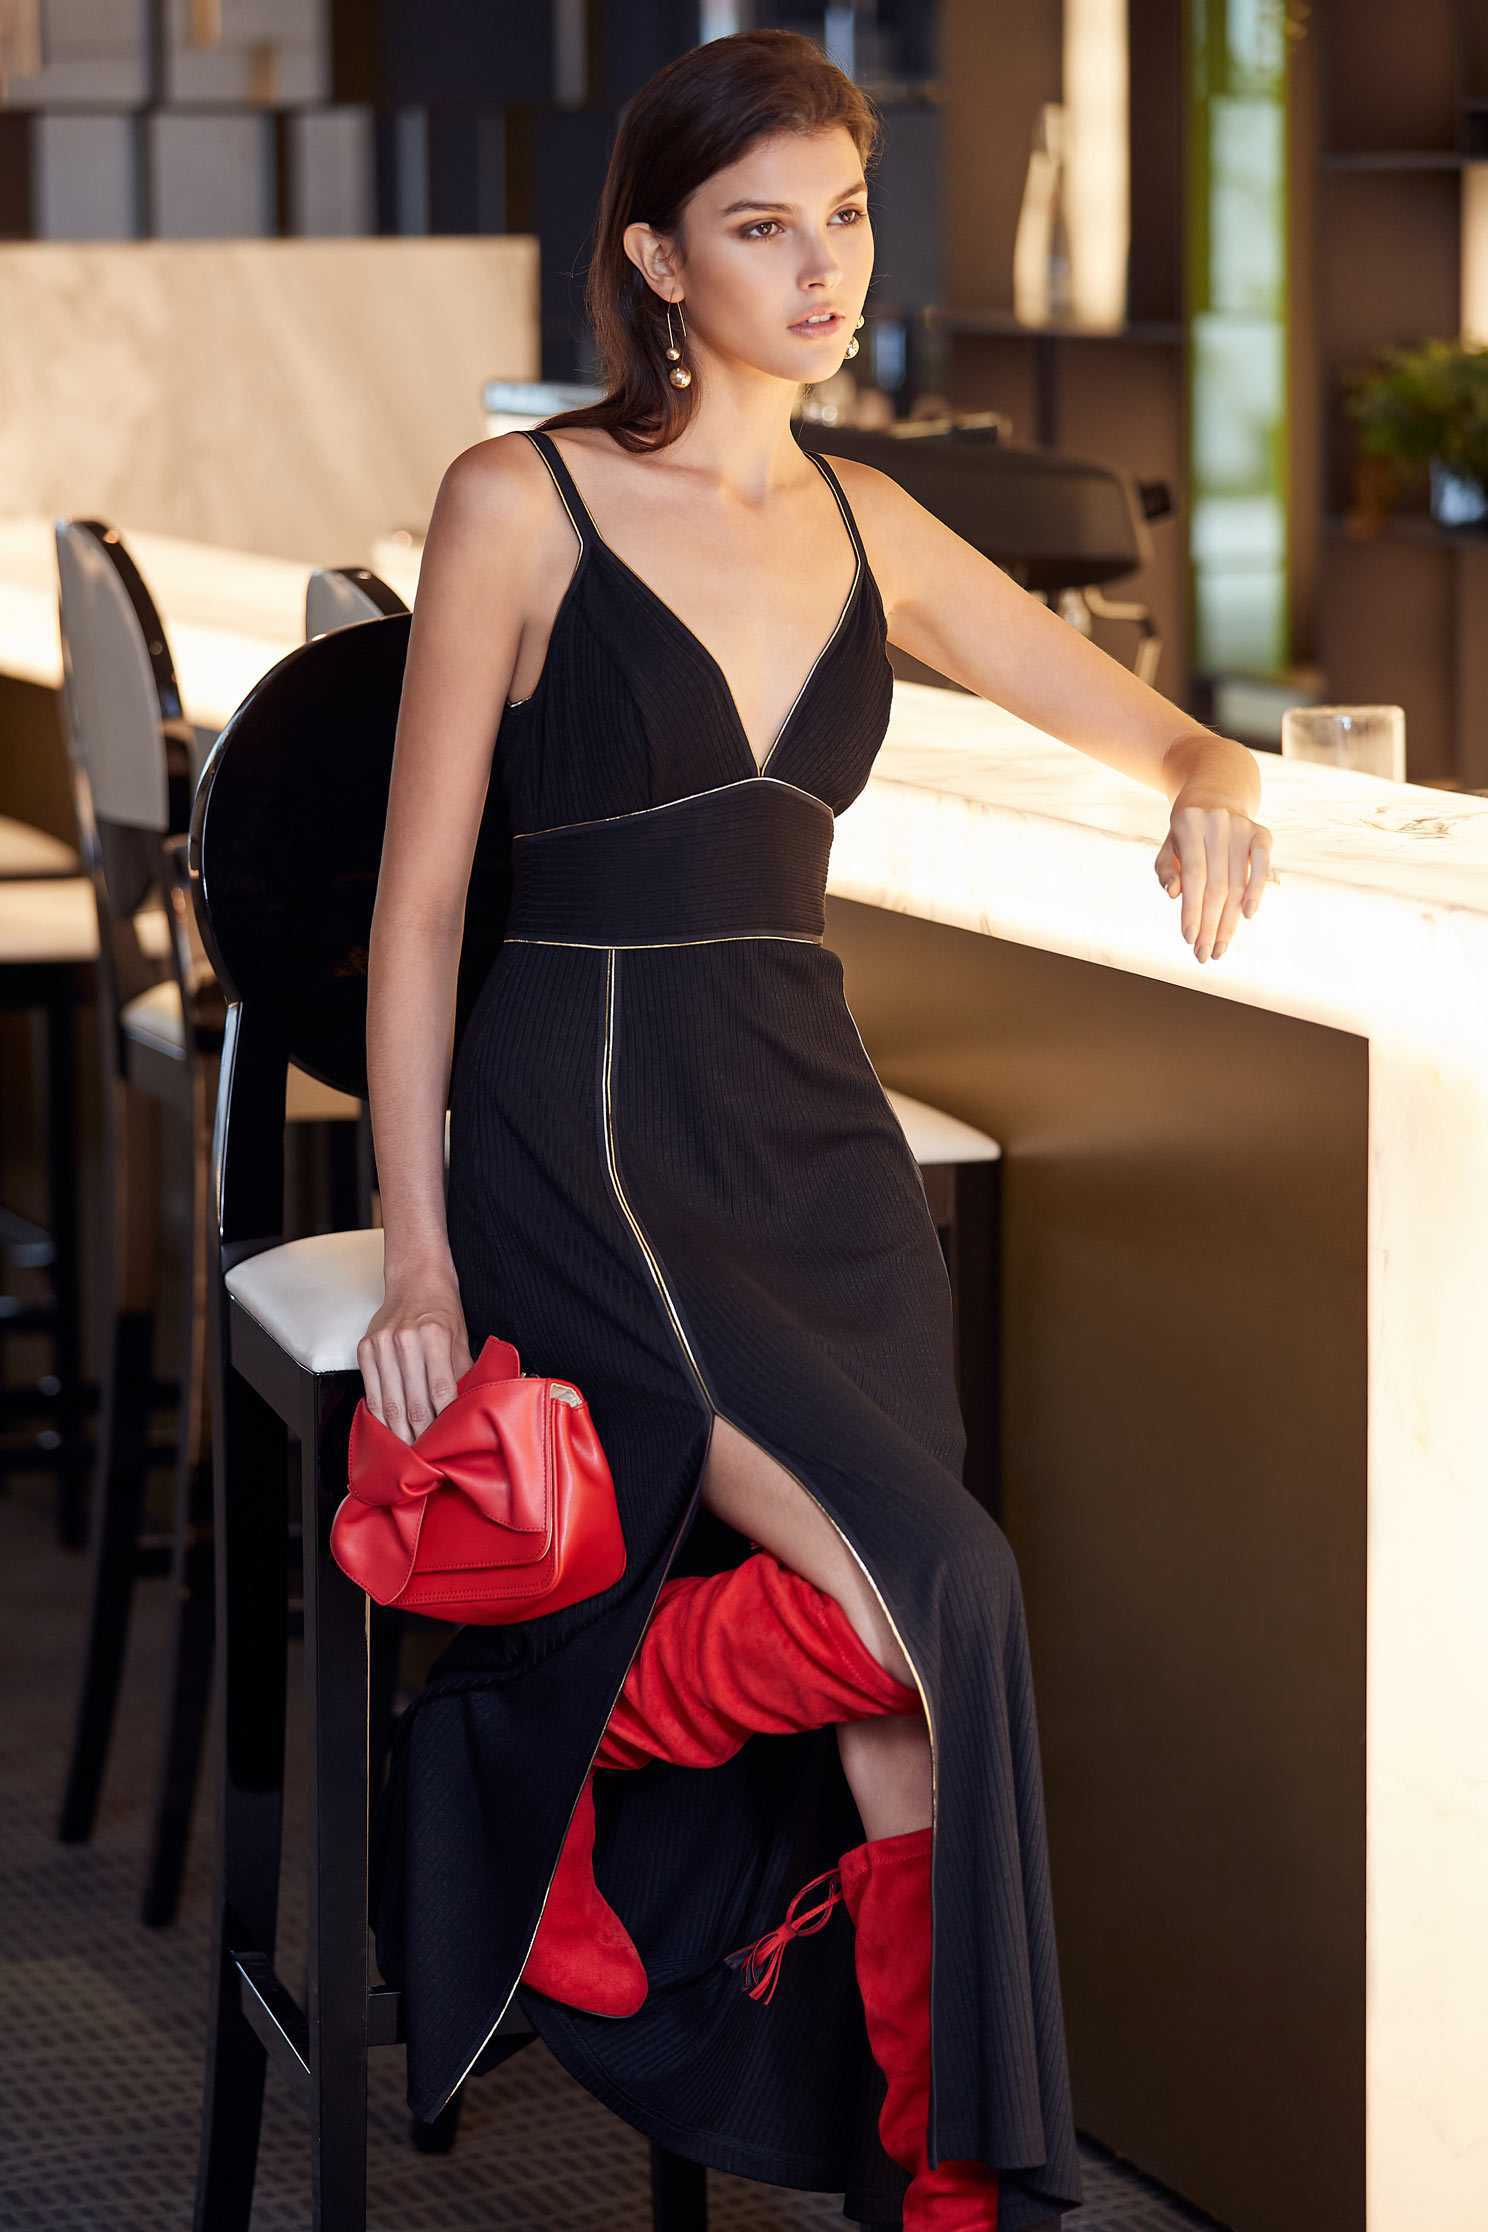 Sexy spaghetti strap dress